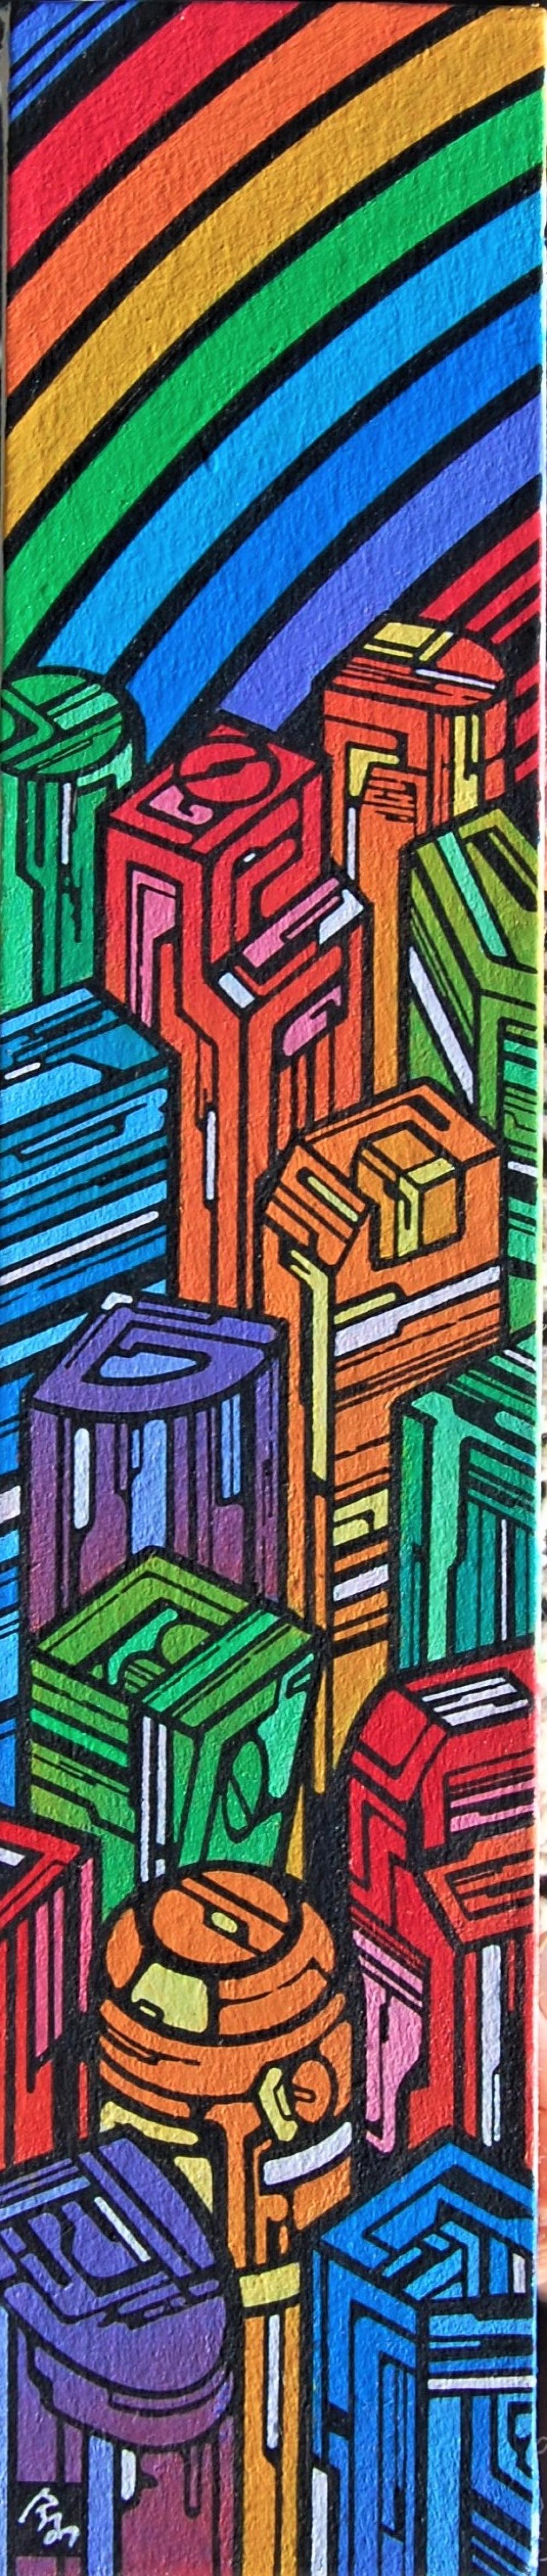 exid807wid767 / 虹の映る街